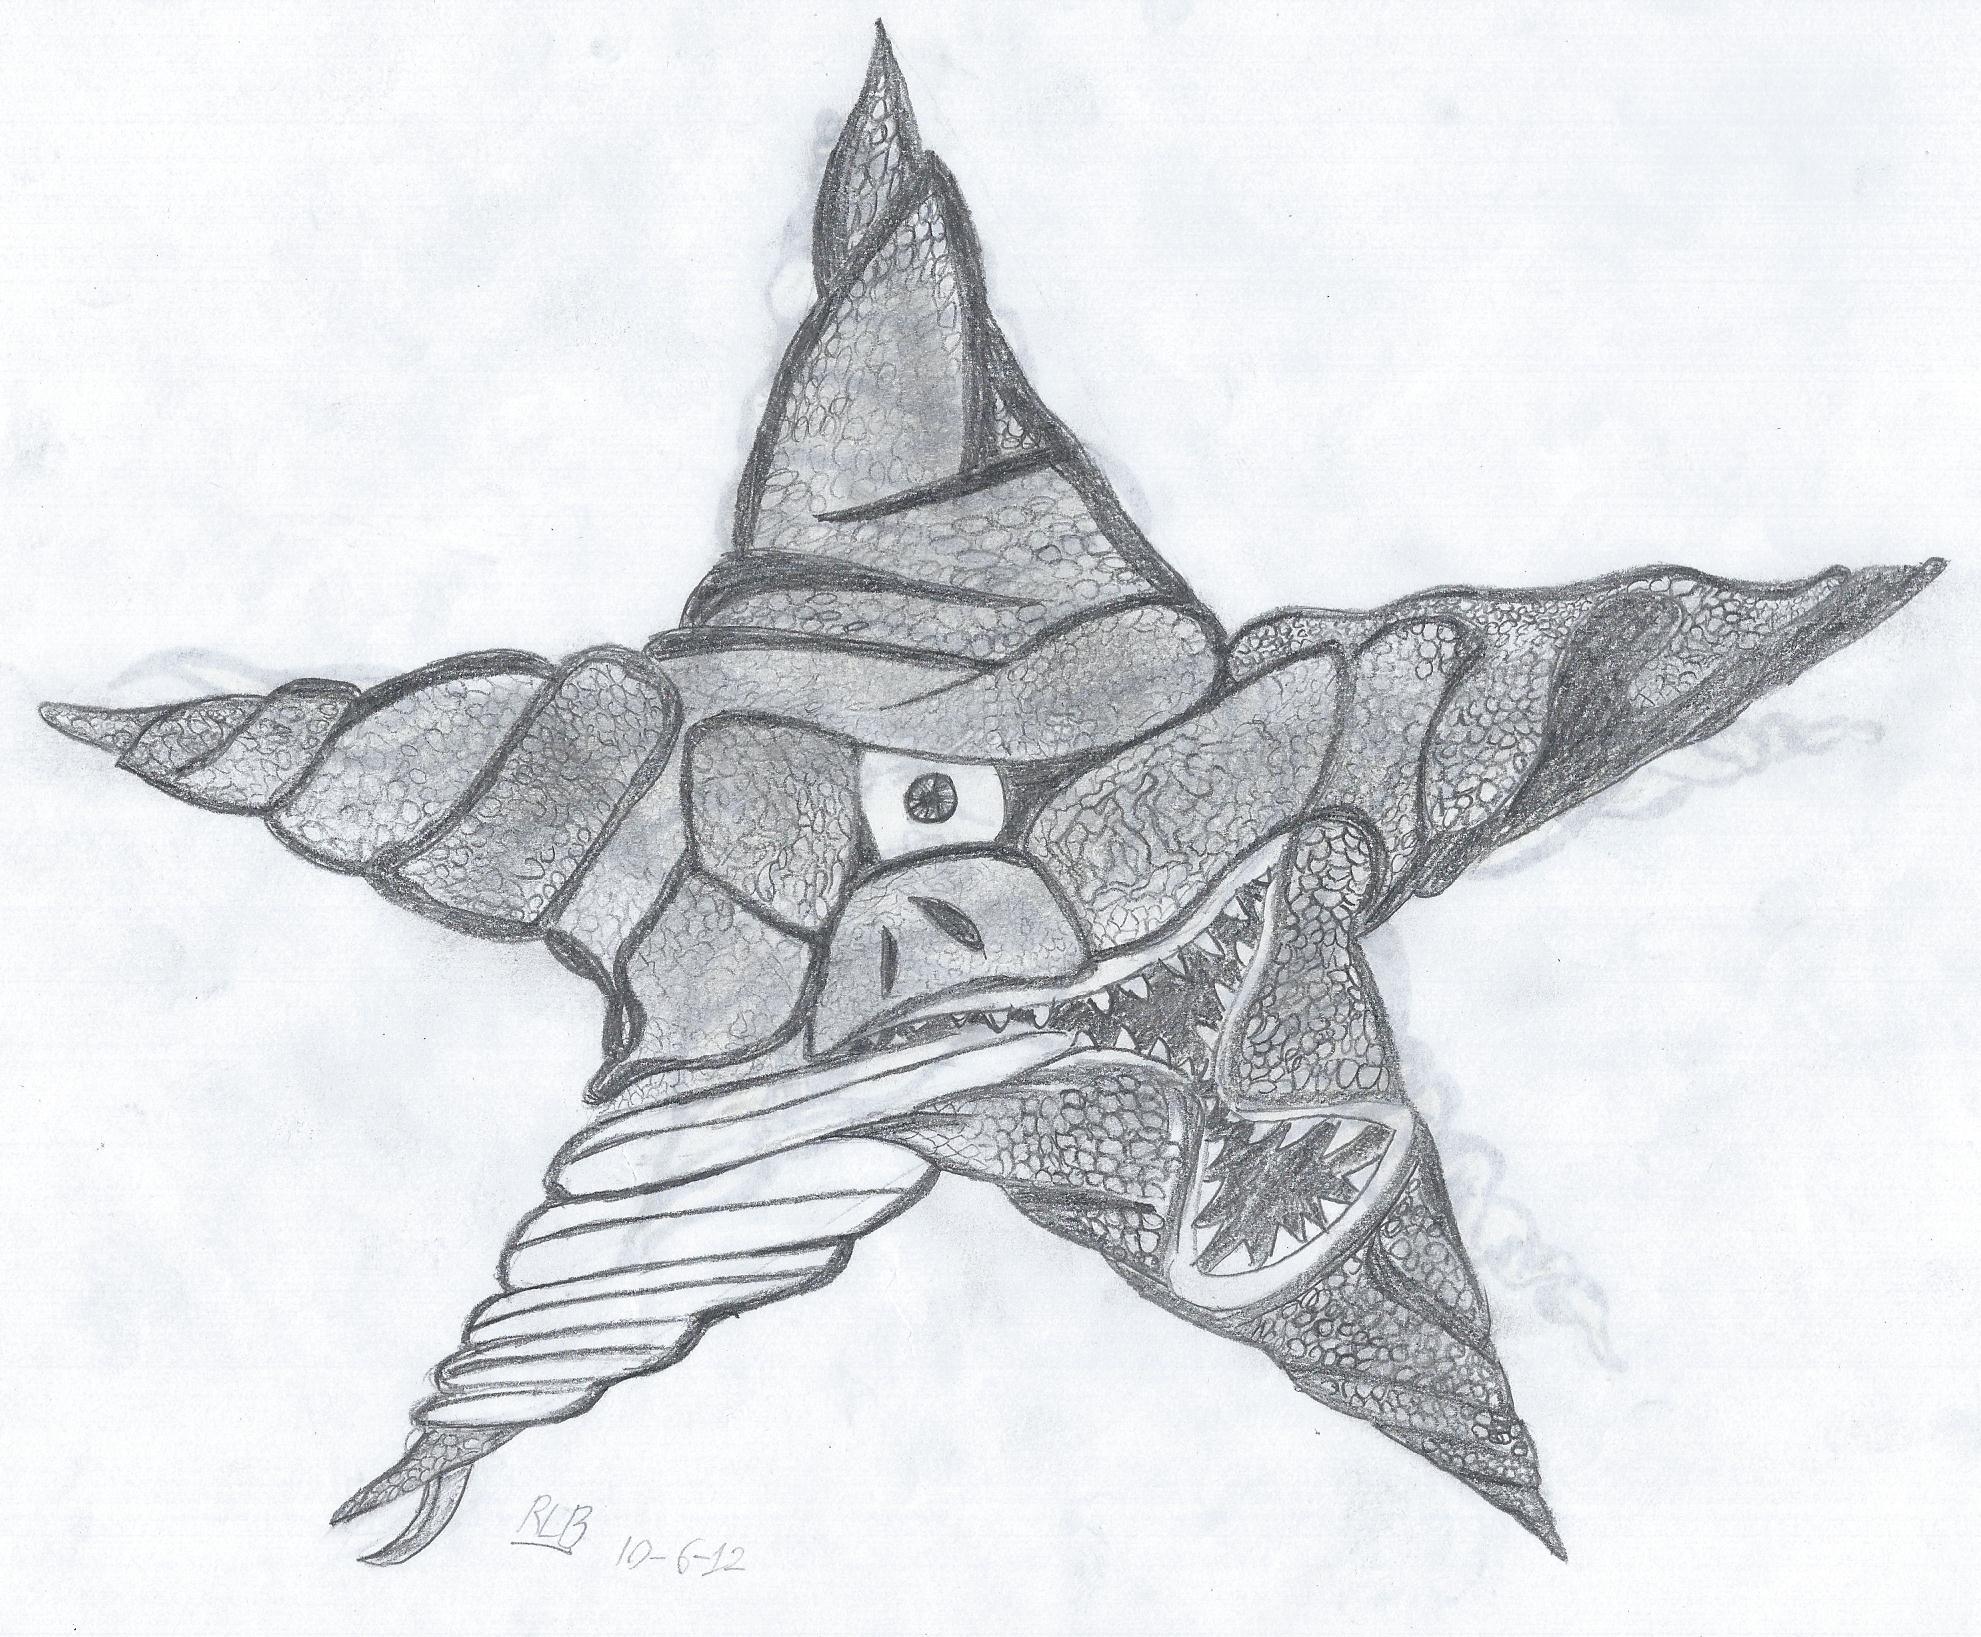 humanoid star